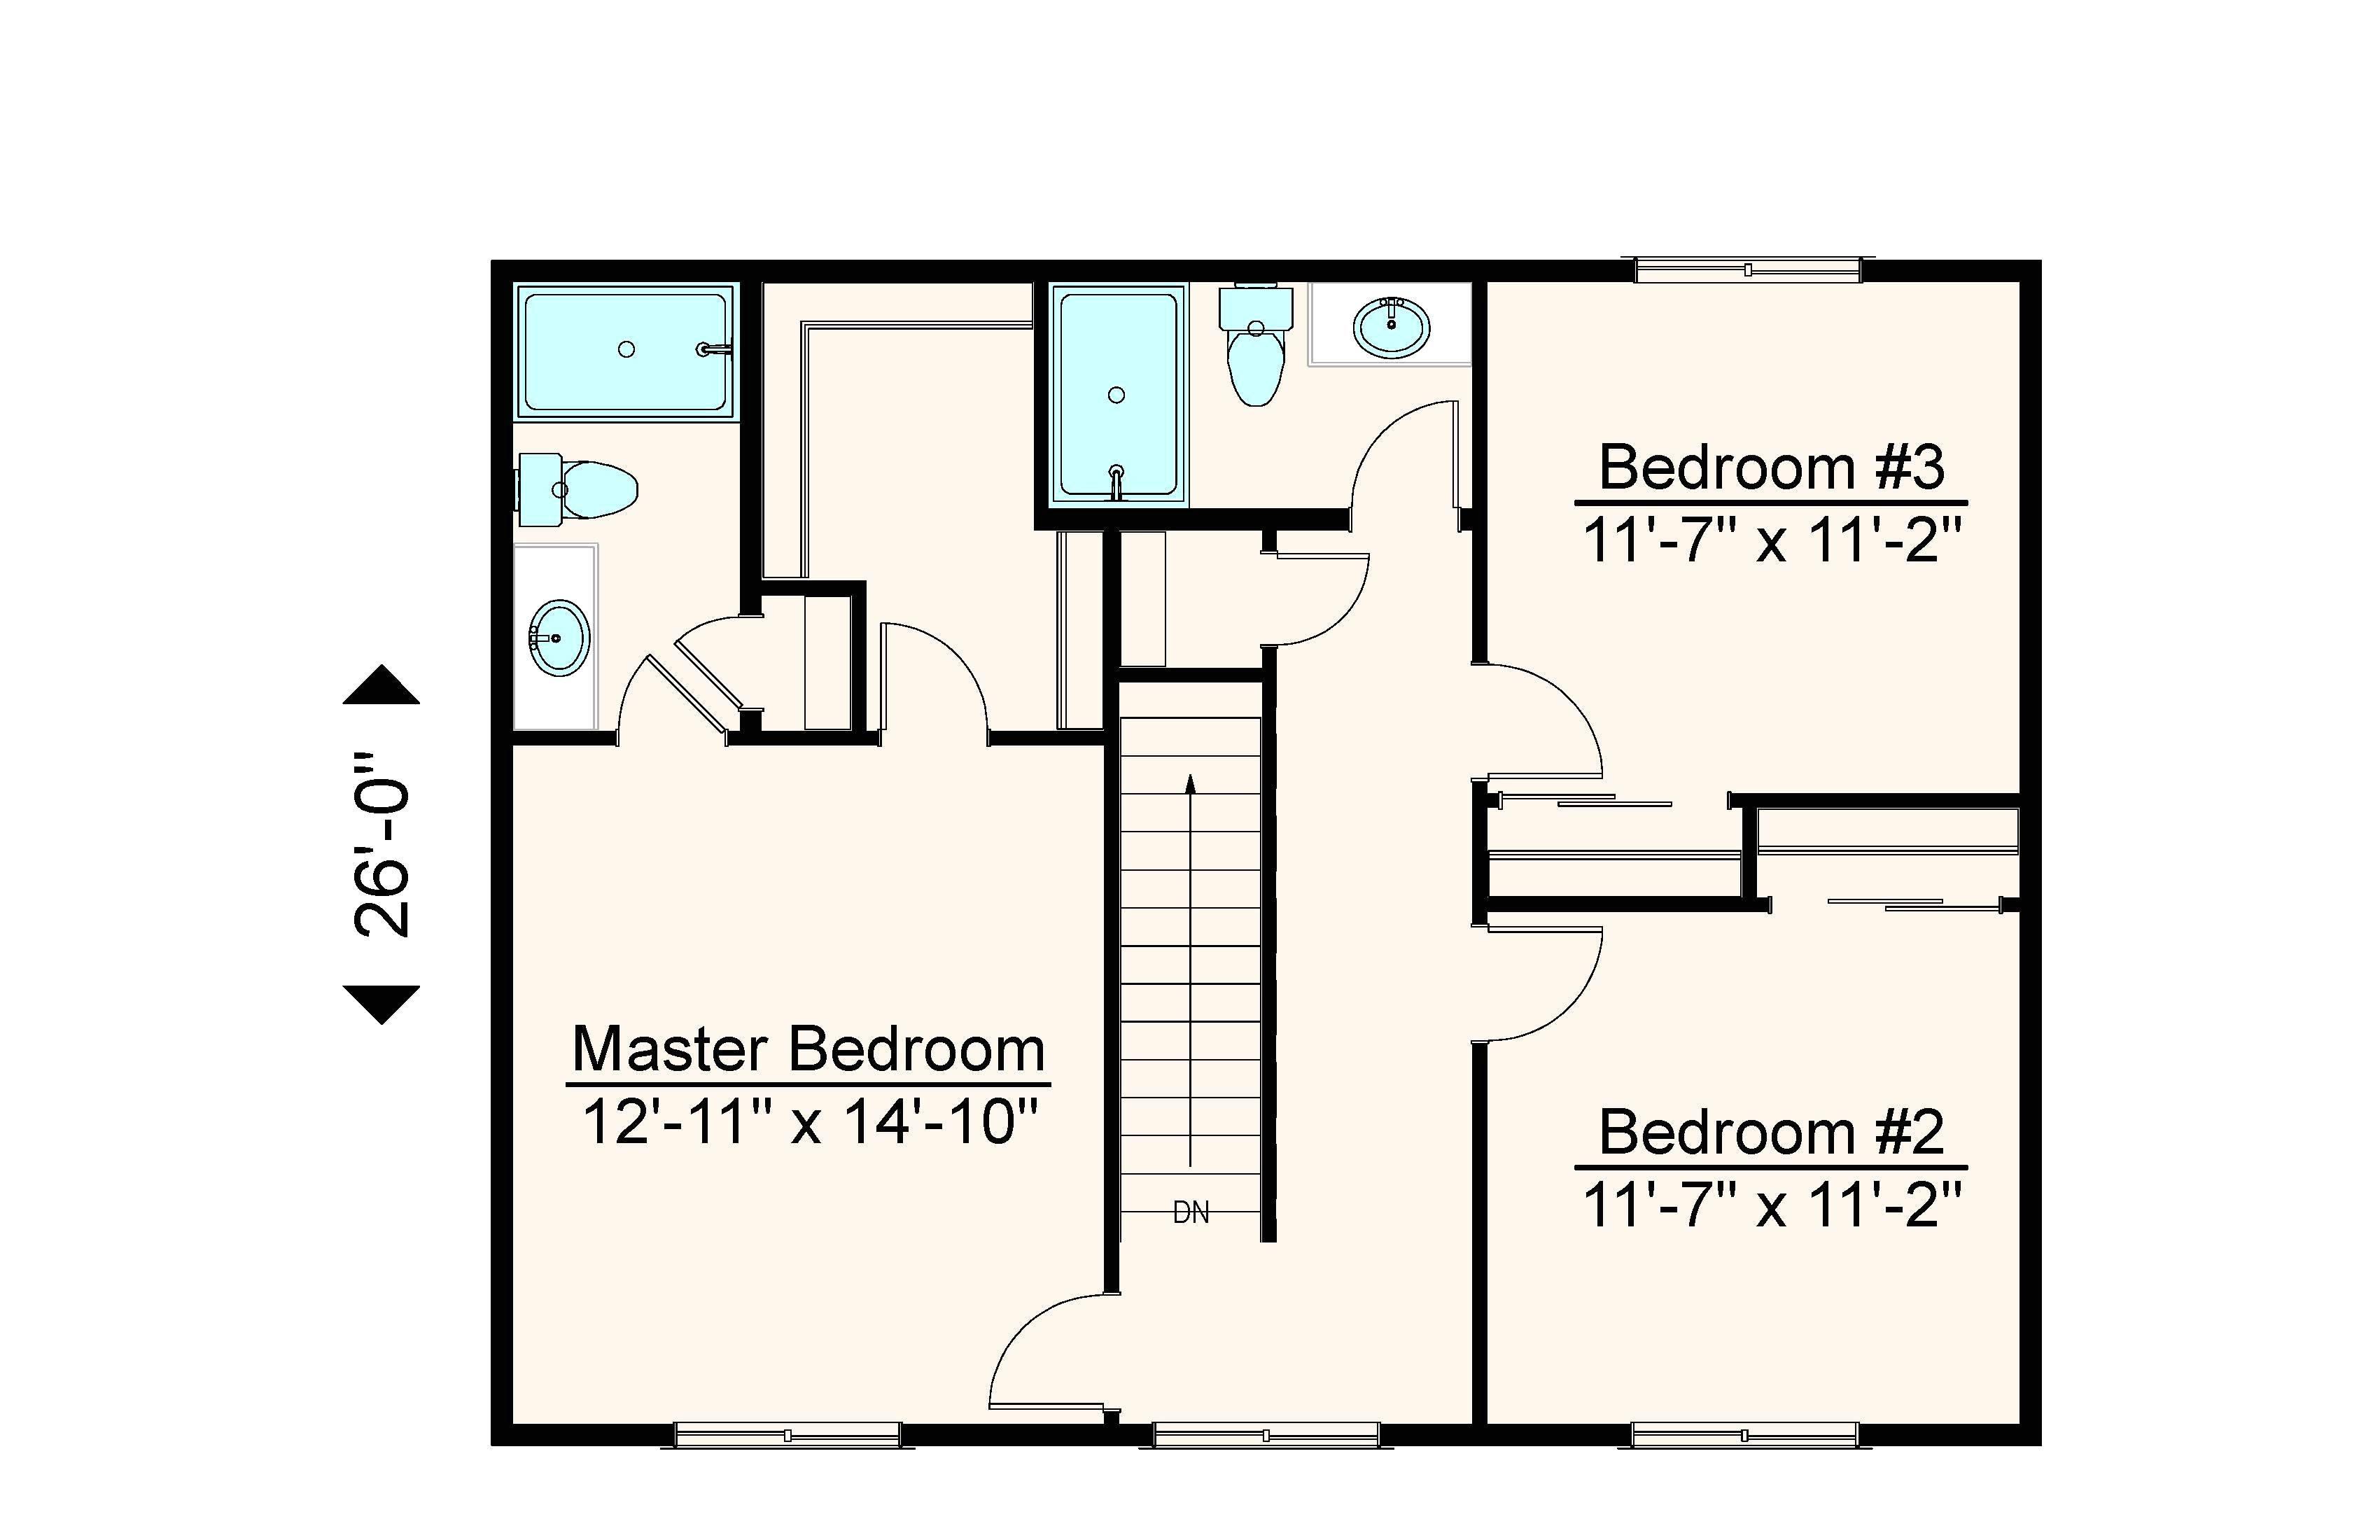 lexar homes floor plans beautiful 28 beautiful lexar homes floor plans home plan ideas home plan